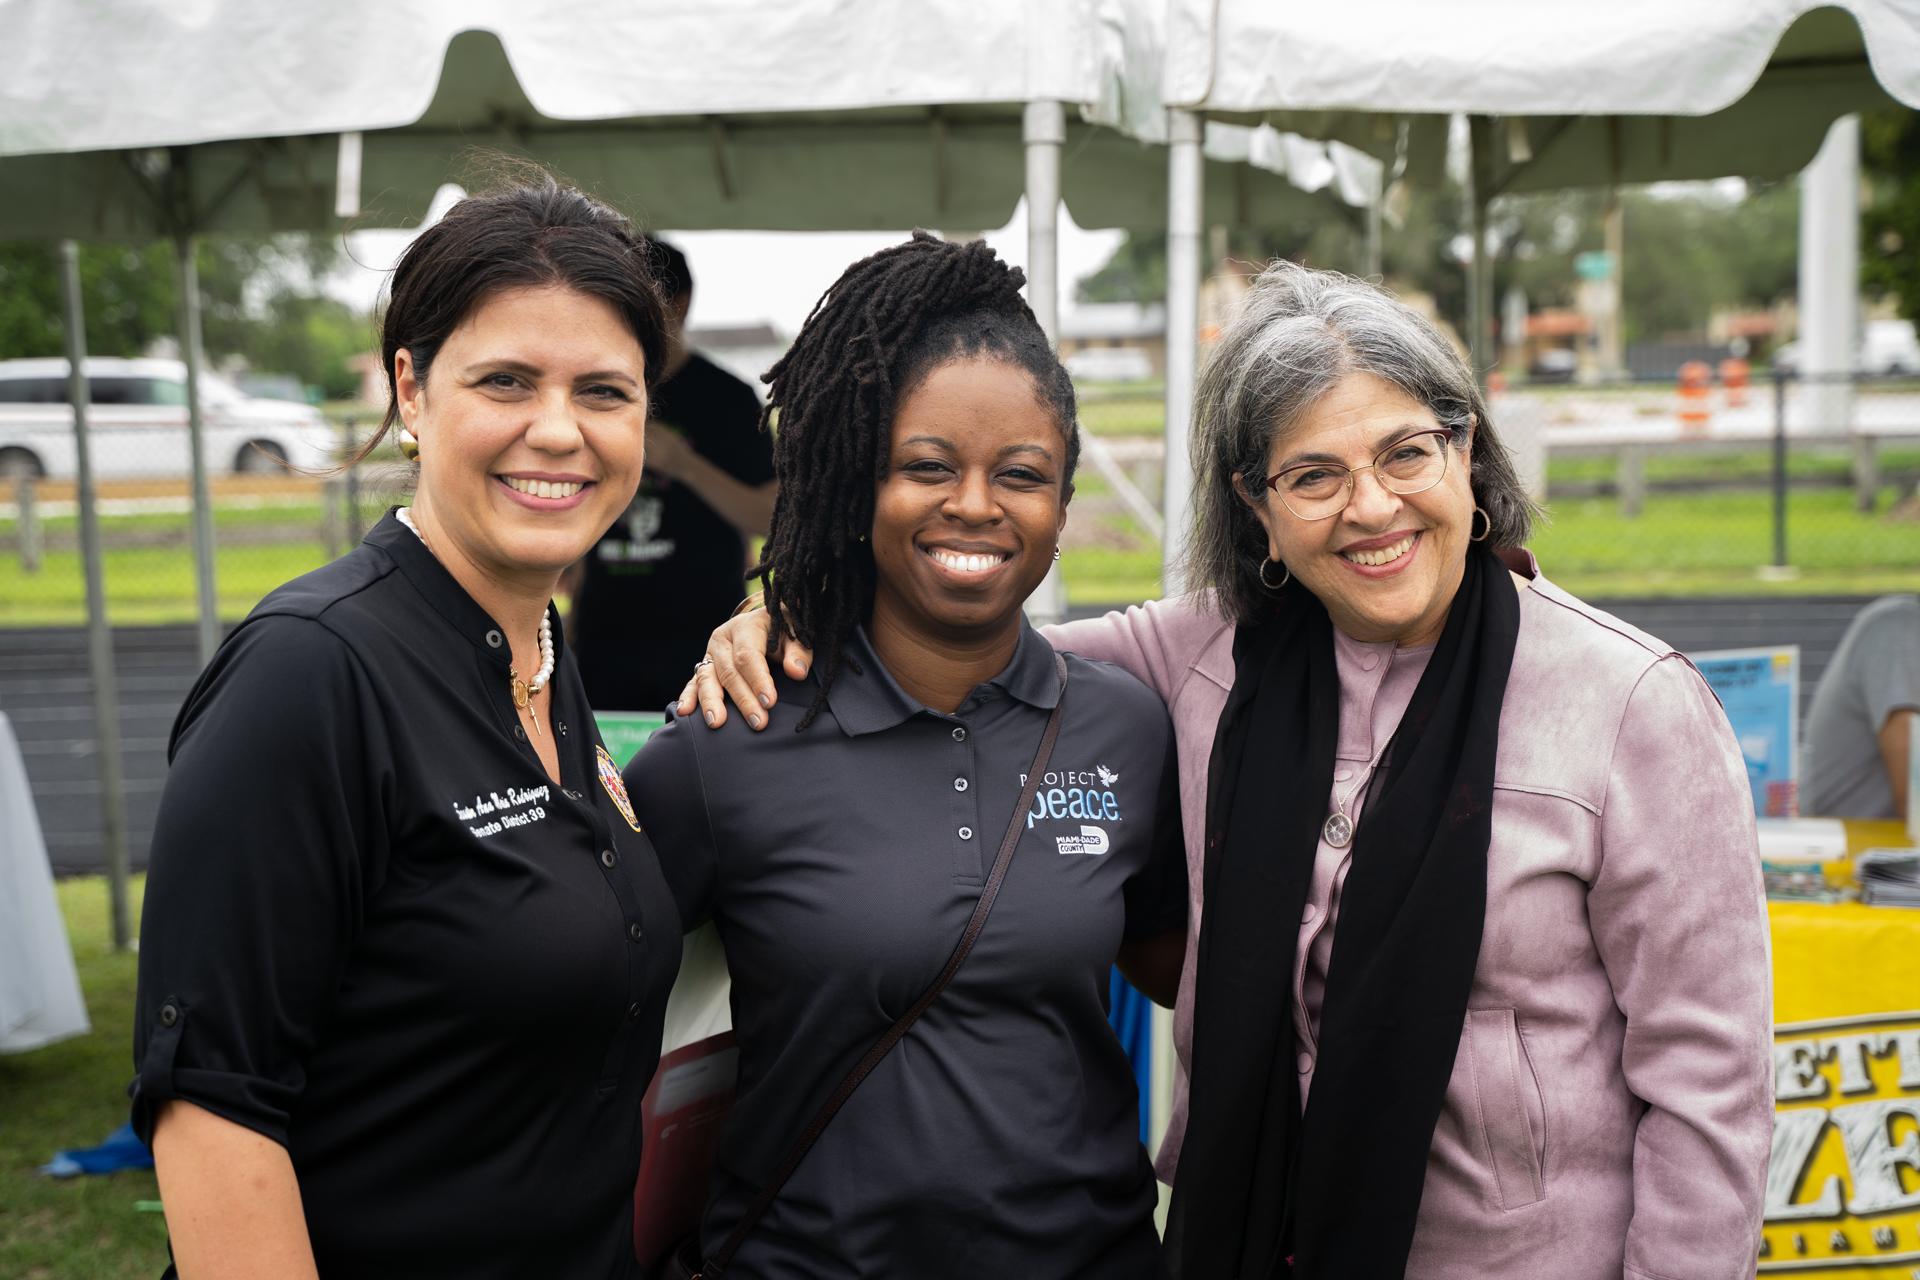 Project P.E.A.C.E. Community Fun Day Attracts Notable Community Support